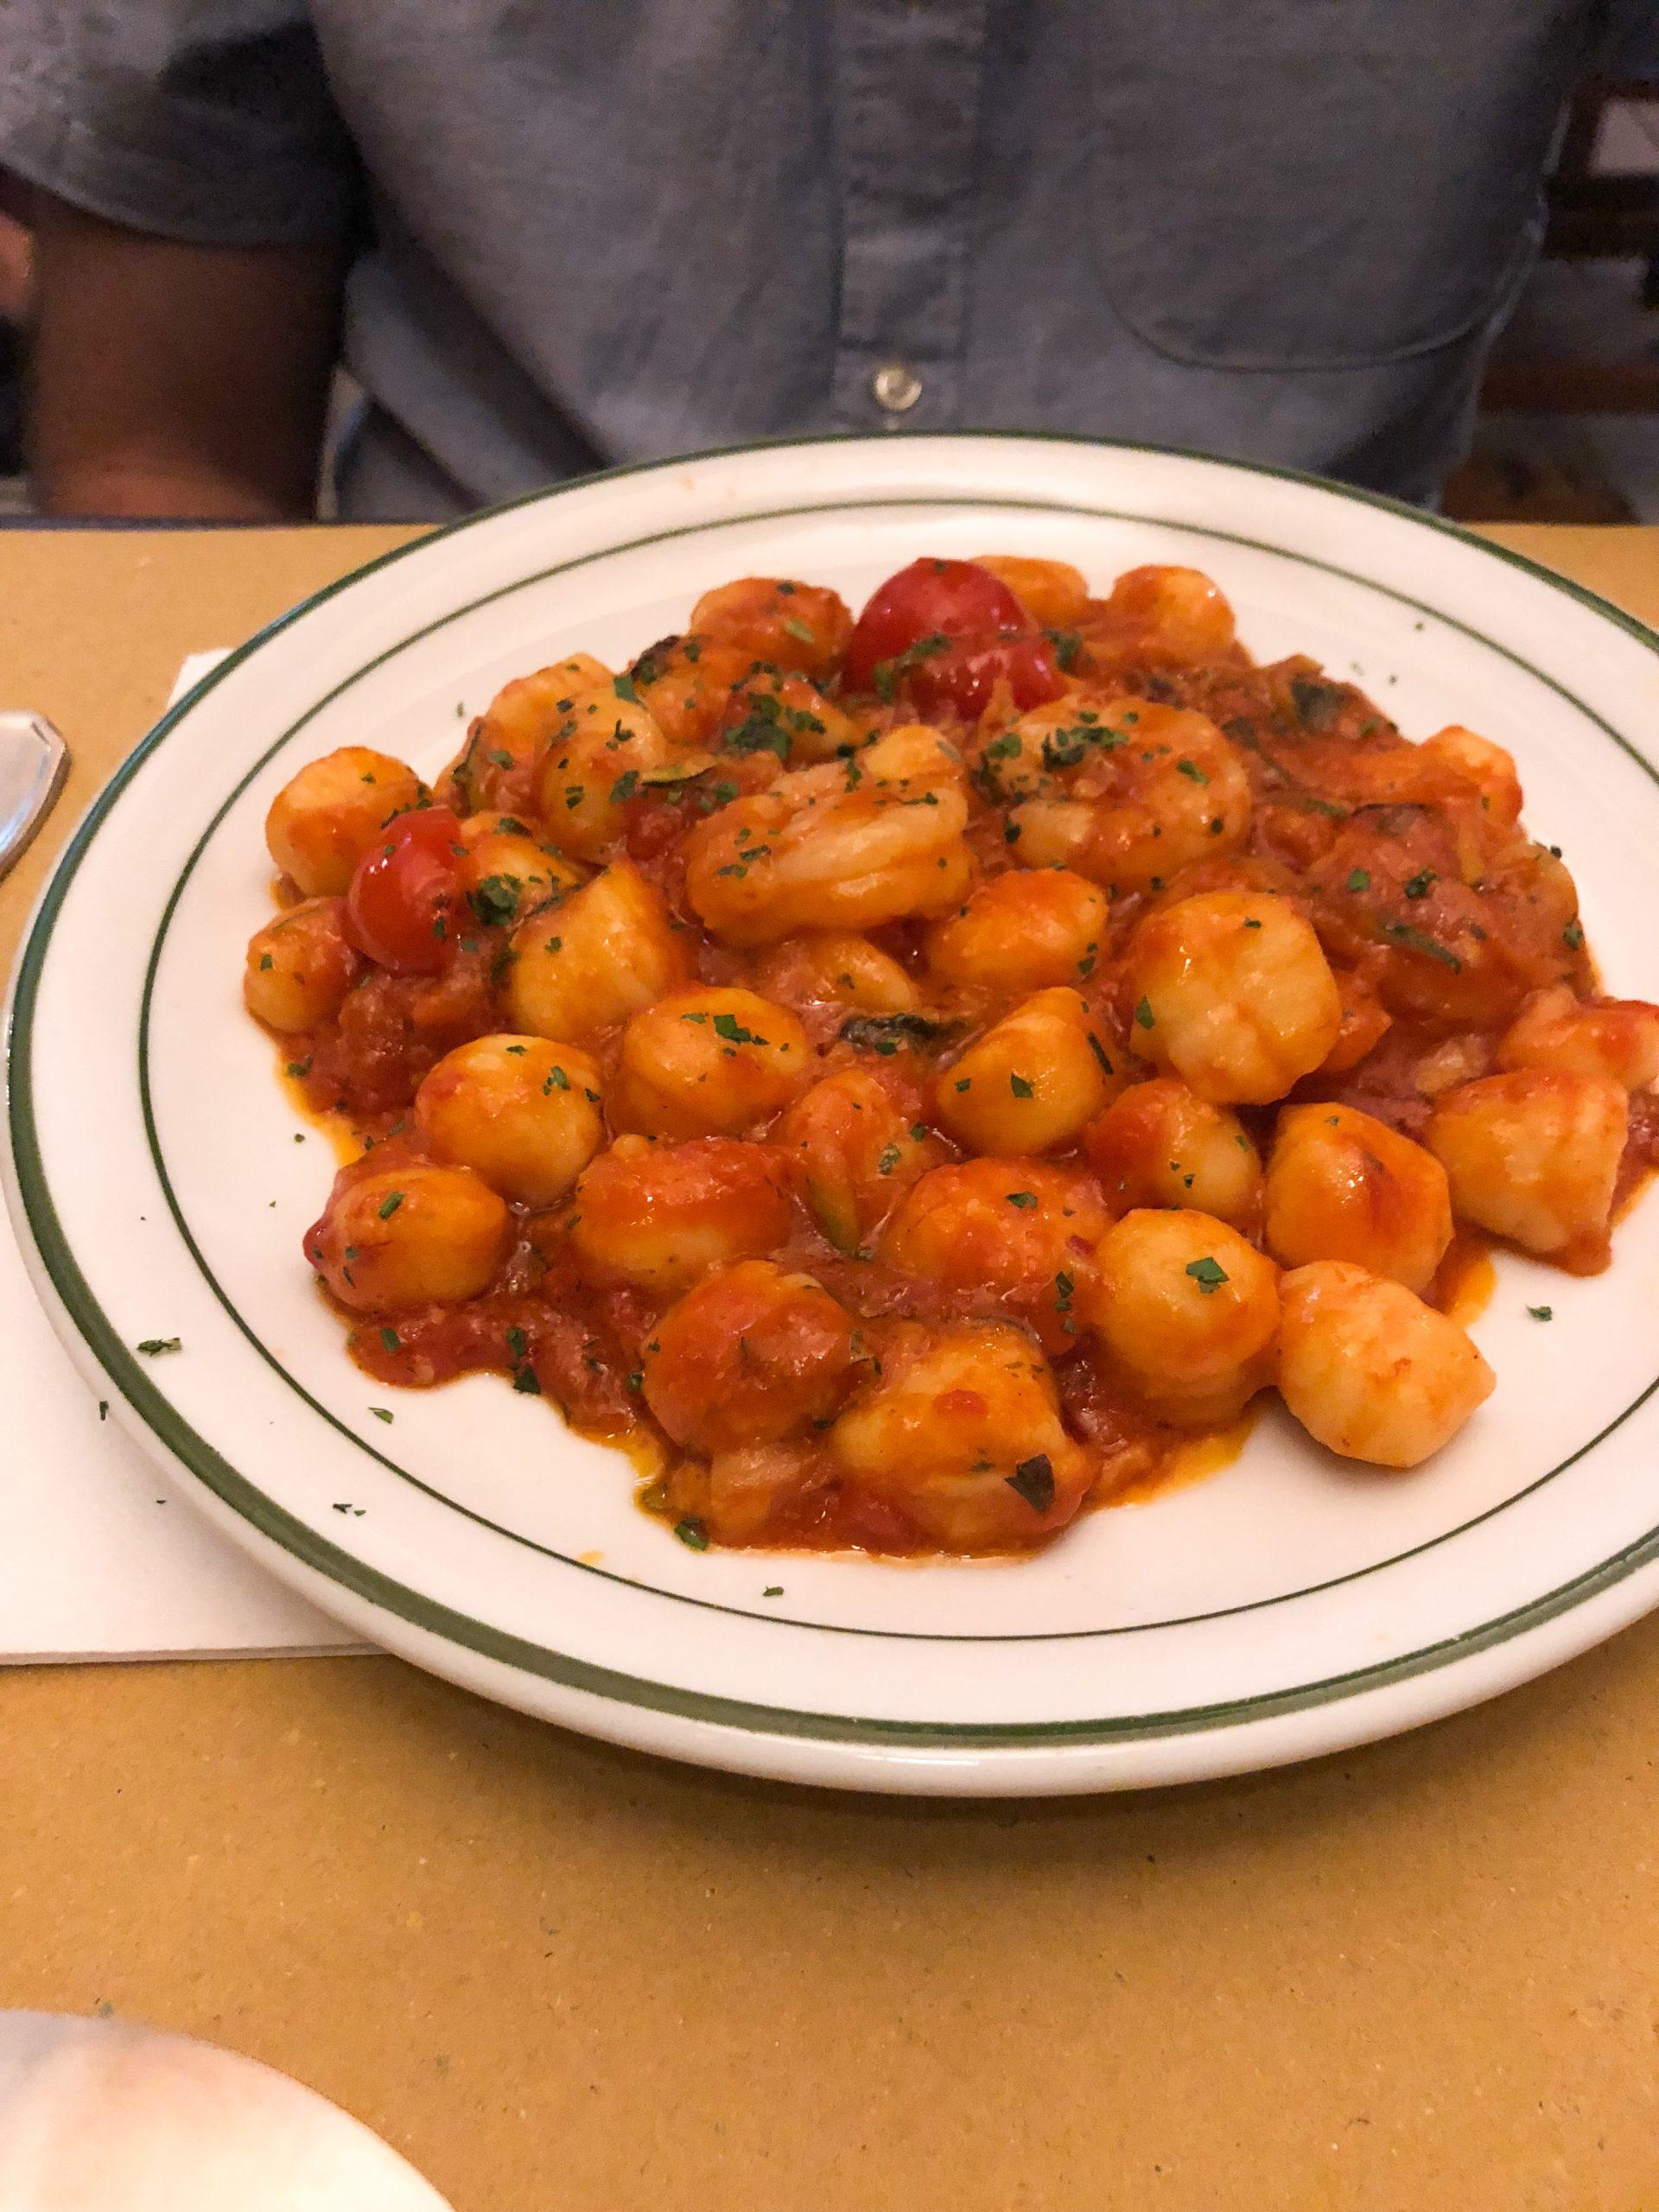 shrimp with gnocchi at Osteria del Cinghiale Bianco